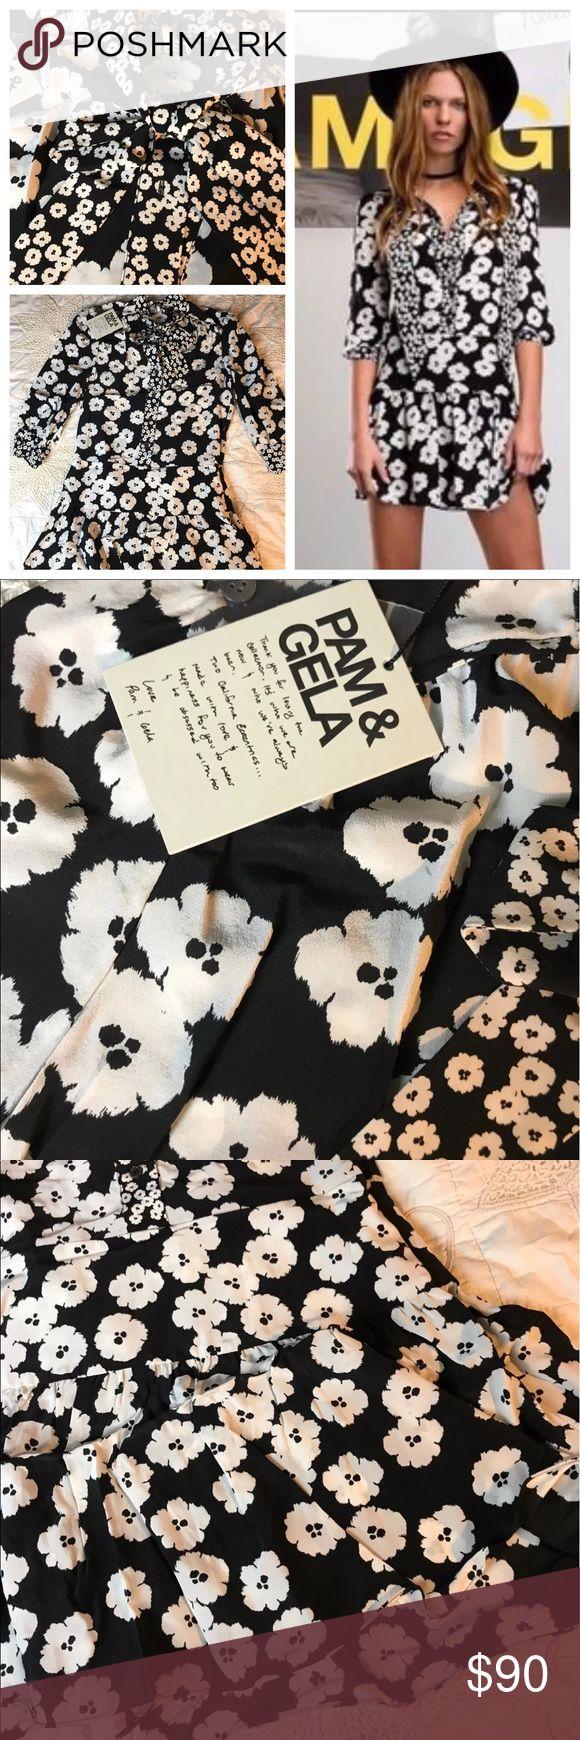 Pam & Gela 100% Silk Dress Black Poppy Print S Pam & Gela 100% Silk Dress Black Poppy Print Boho Chic New With Tags Small Ties at neck side zip   Stock BC7bag5 Pam & Gela Dresses Mini